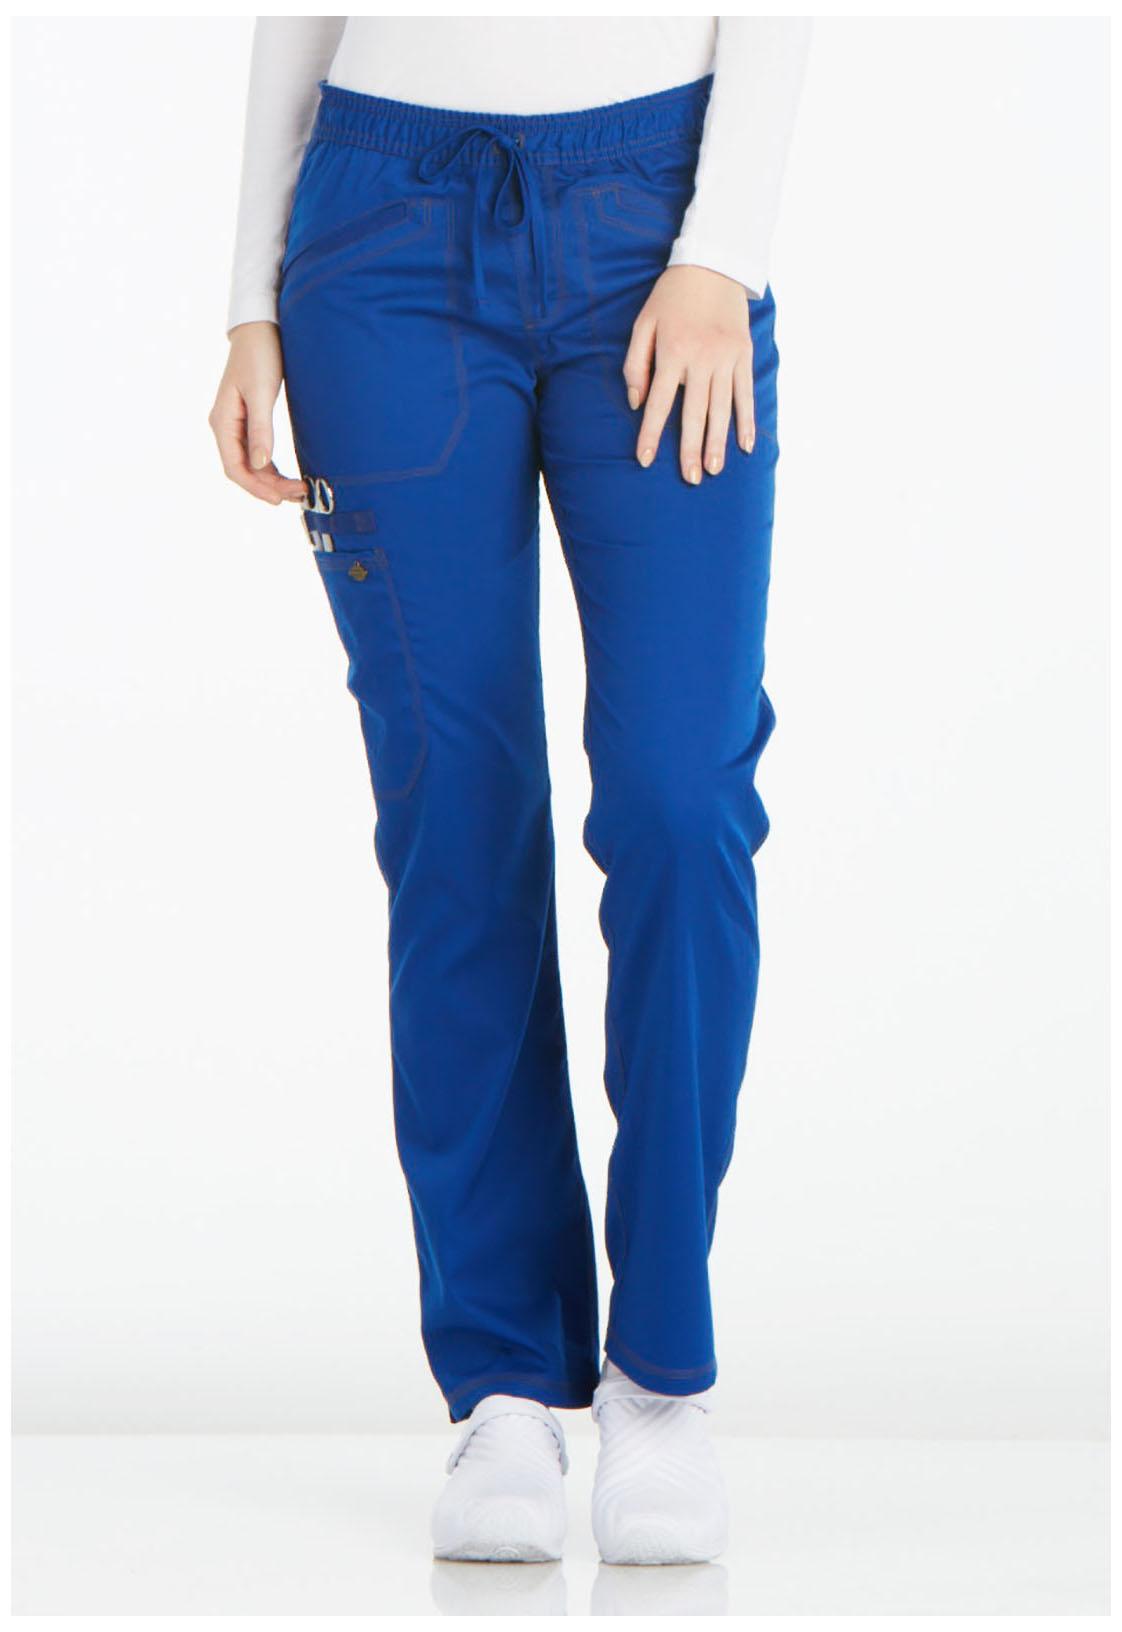 42ab85411a2 Essence Mid Rise Straight Leg Drawstring Pant in Galaxy Blue DK106 ...